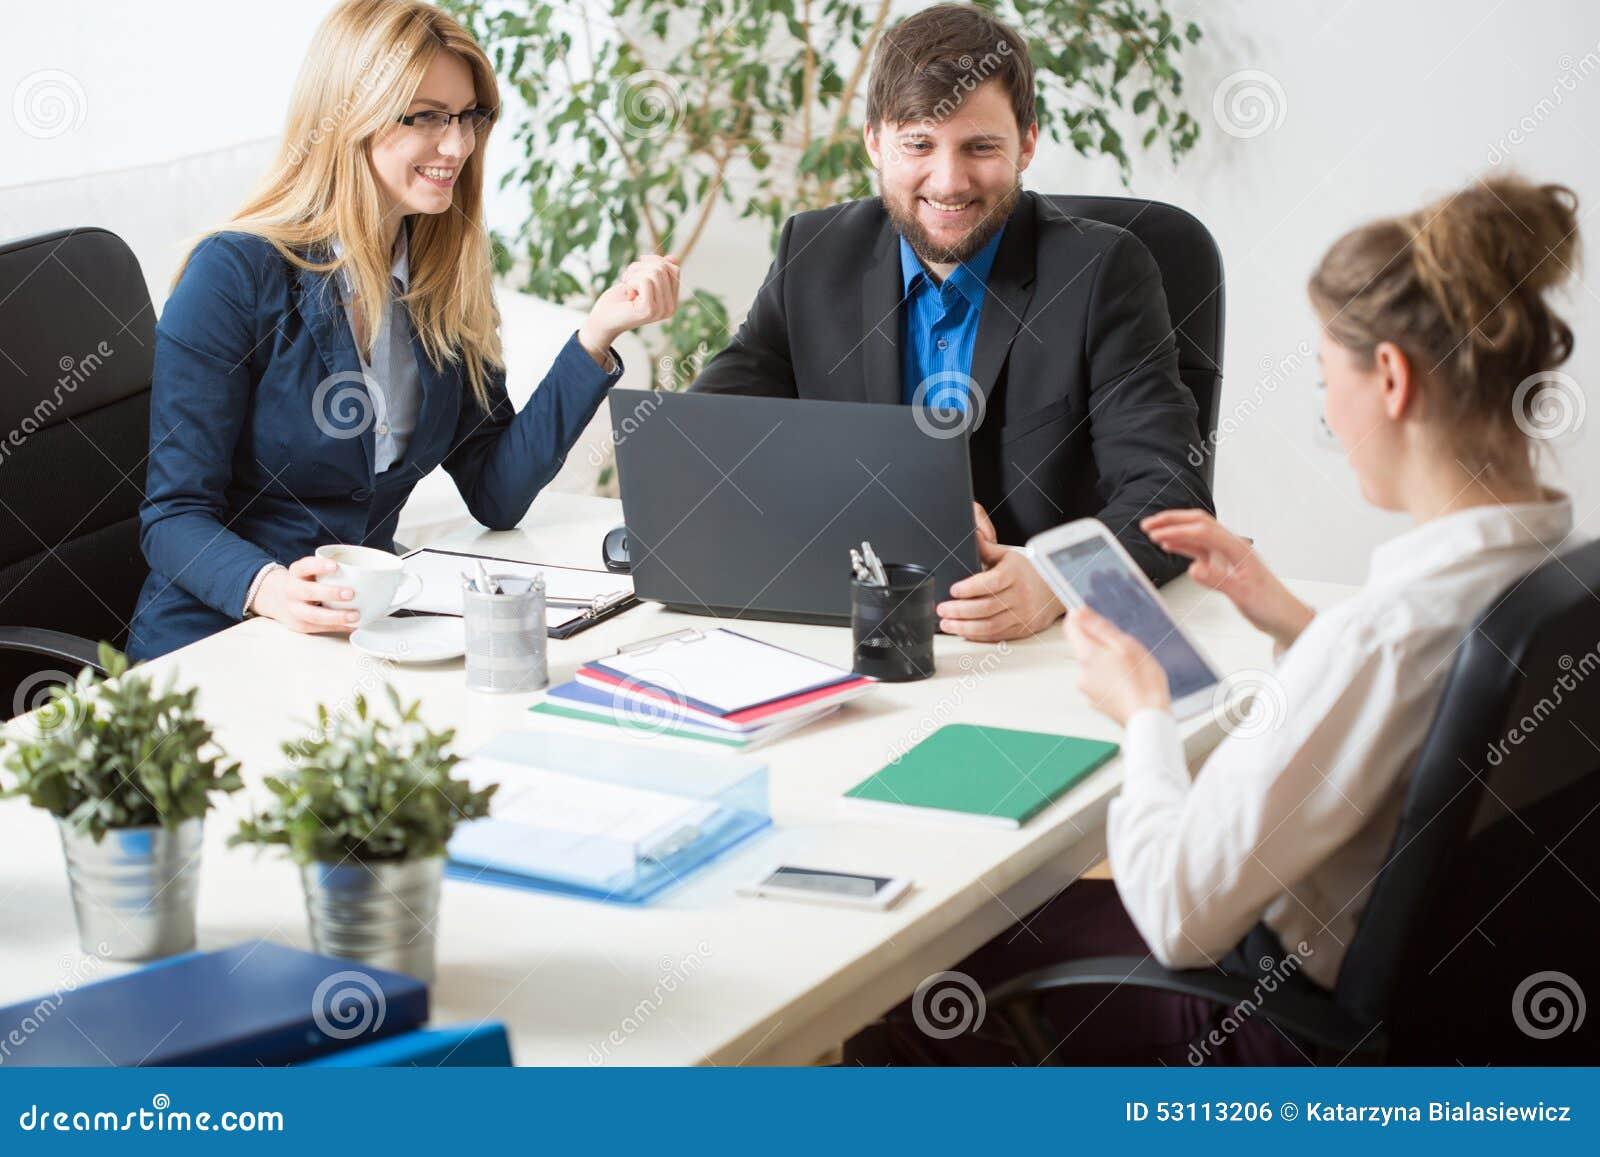 Team work inside the office